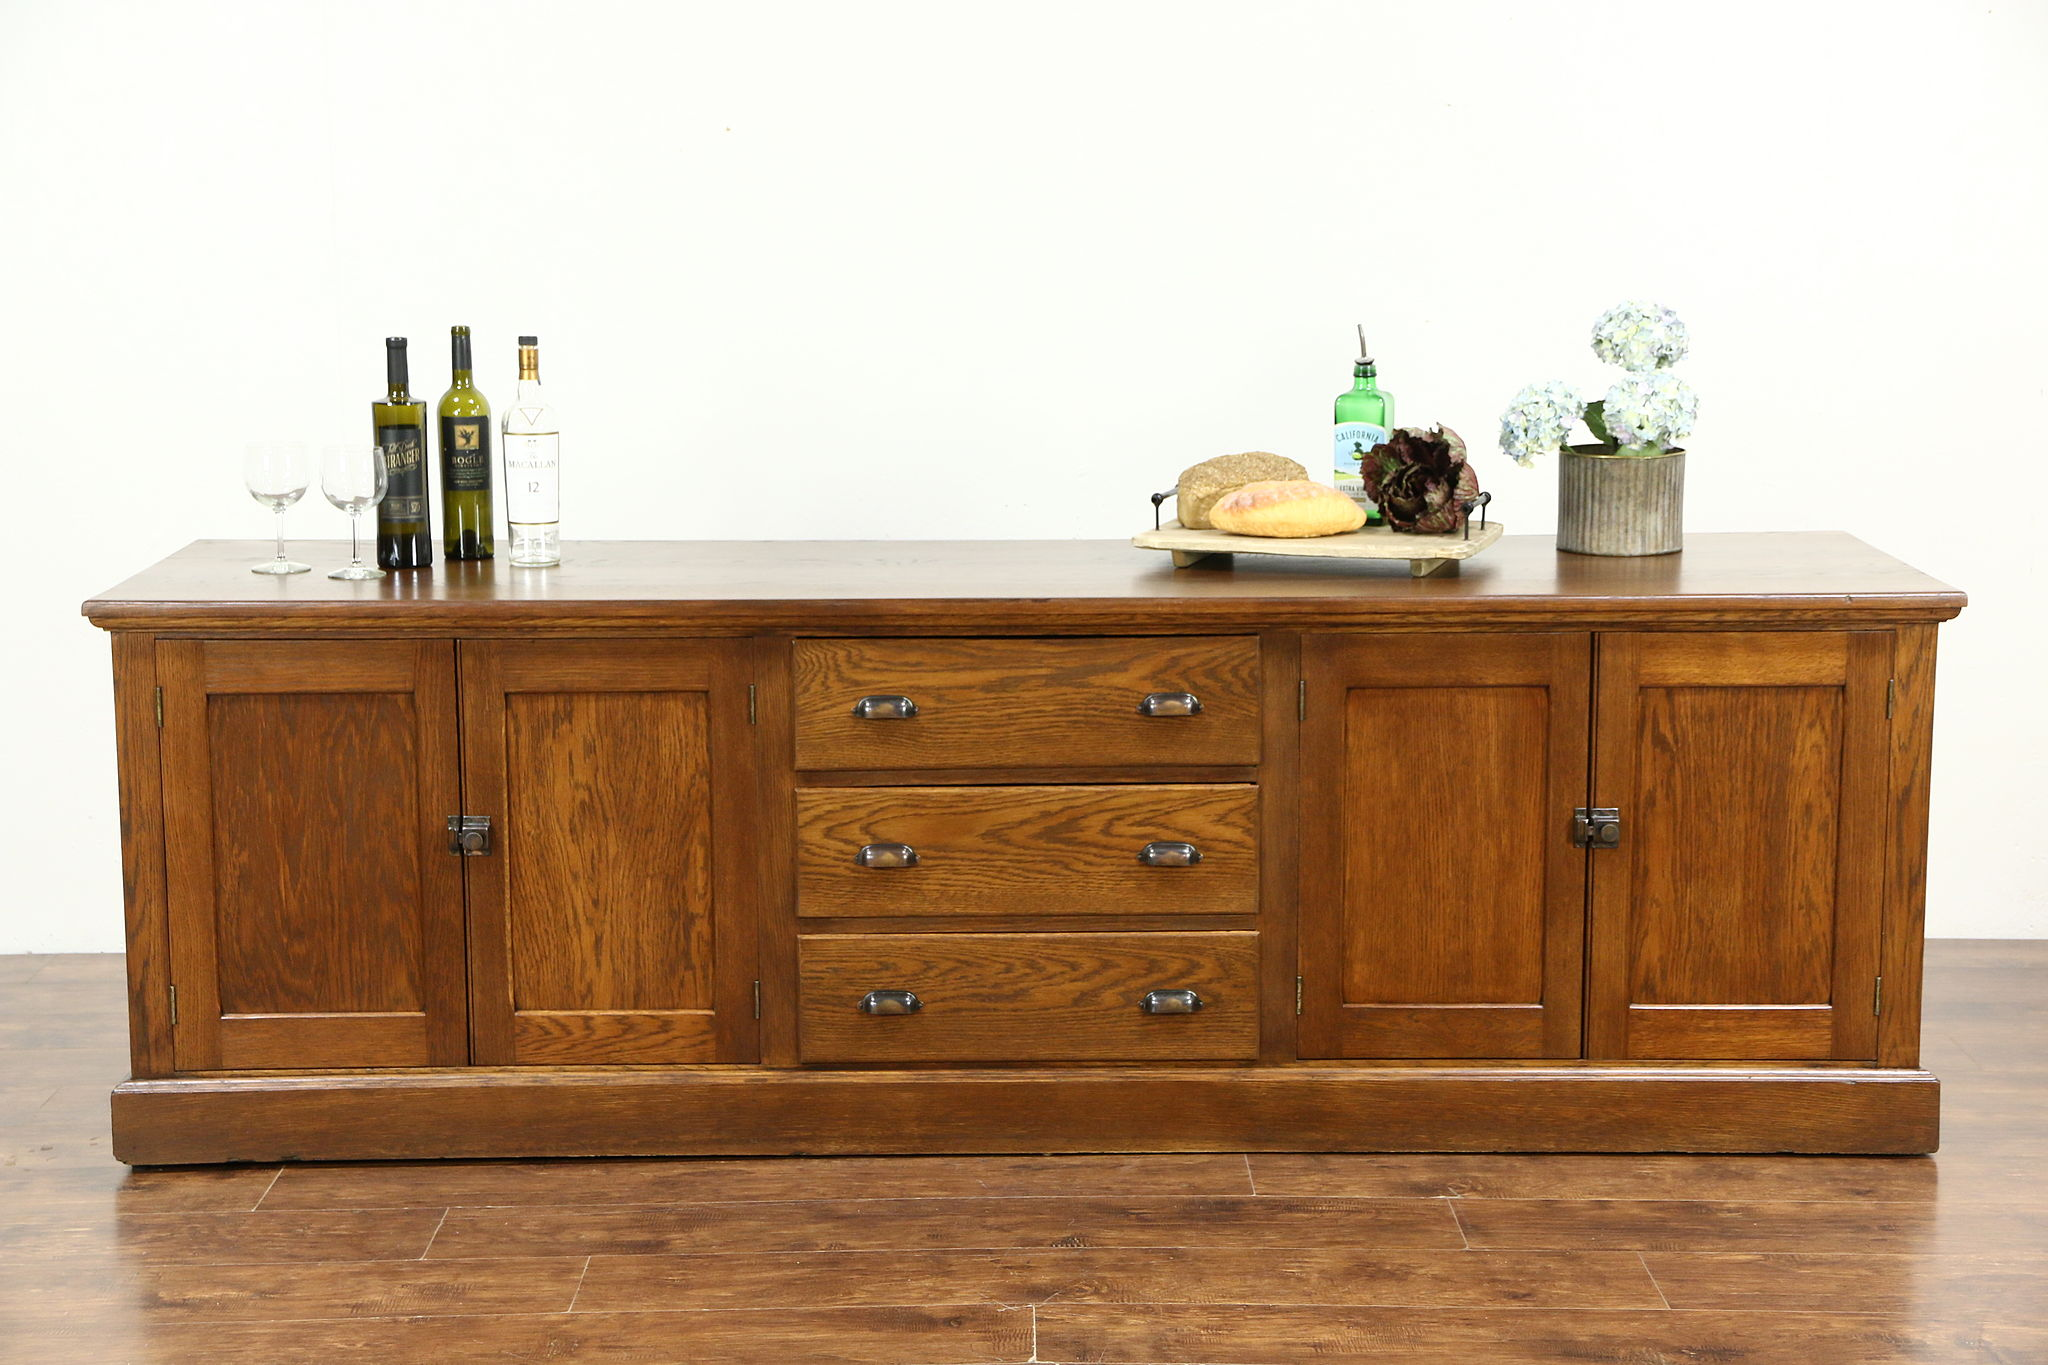 Oak 1900 Antique 8u0027 Kitchen Counter, Sideboard Or TV Console Cabinet